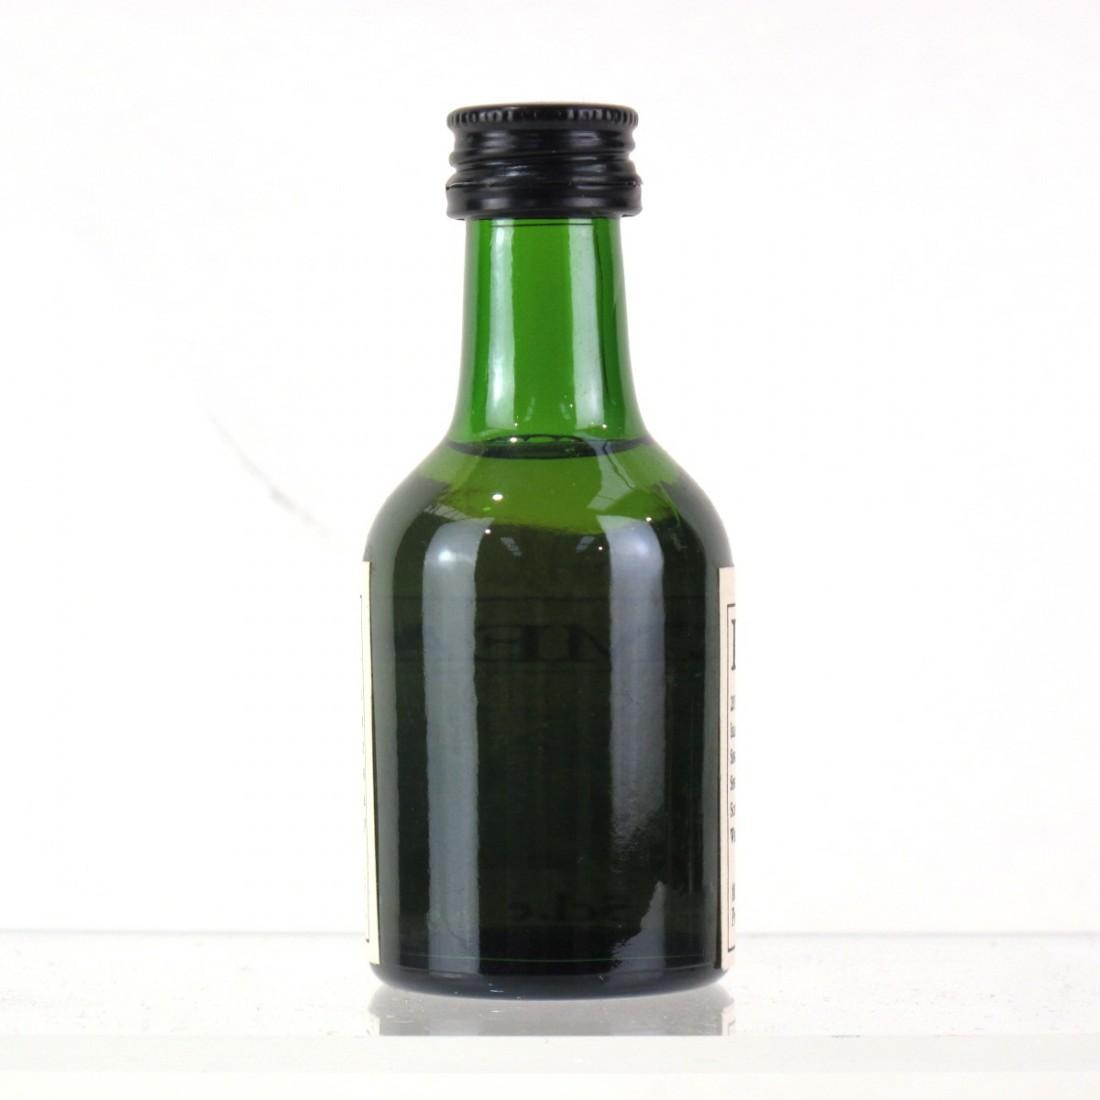 Largiemeanoch / Bowmore Single Islay Malt 20 Year Old Miniature 5cl